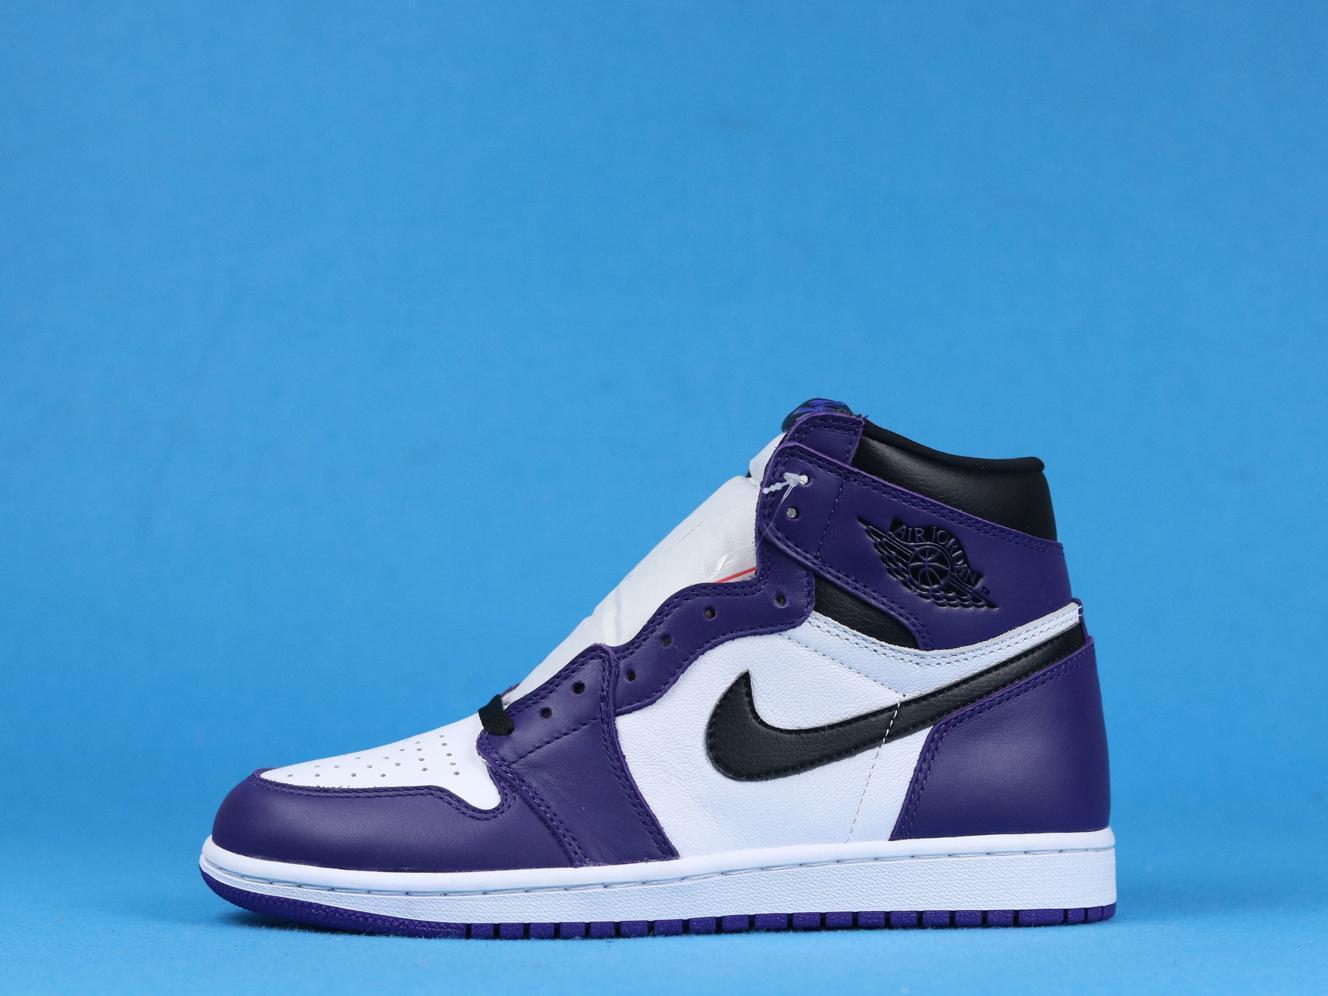 Air Jordan 1 Retro High OG Court Purple 2.0 1